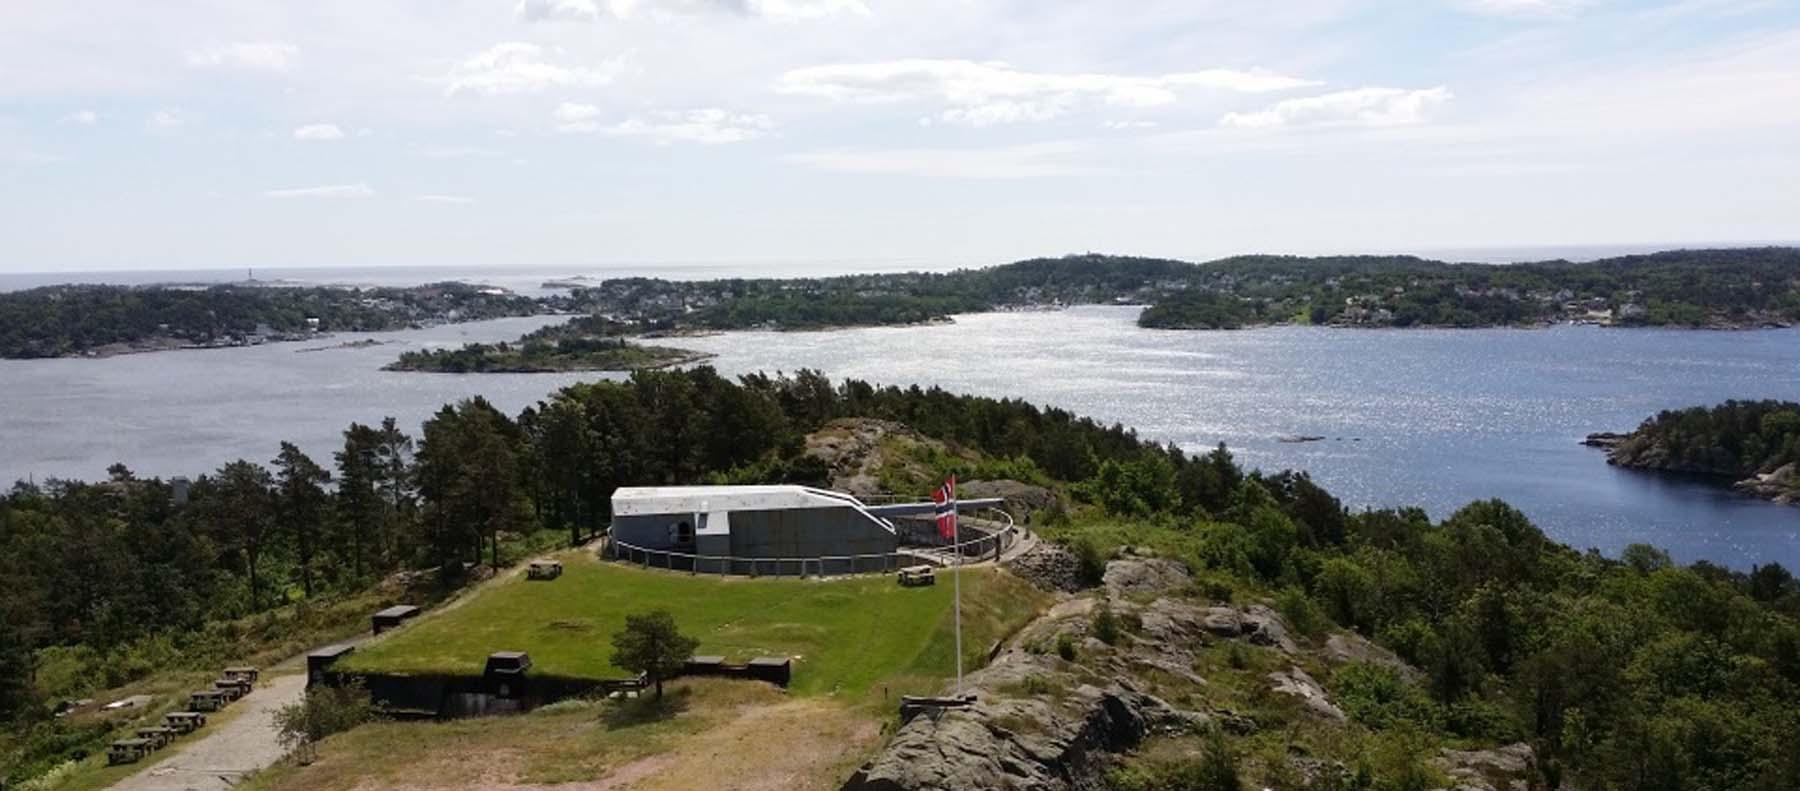 Vest-Agder-museet : Kristiansand Kanonmuseum